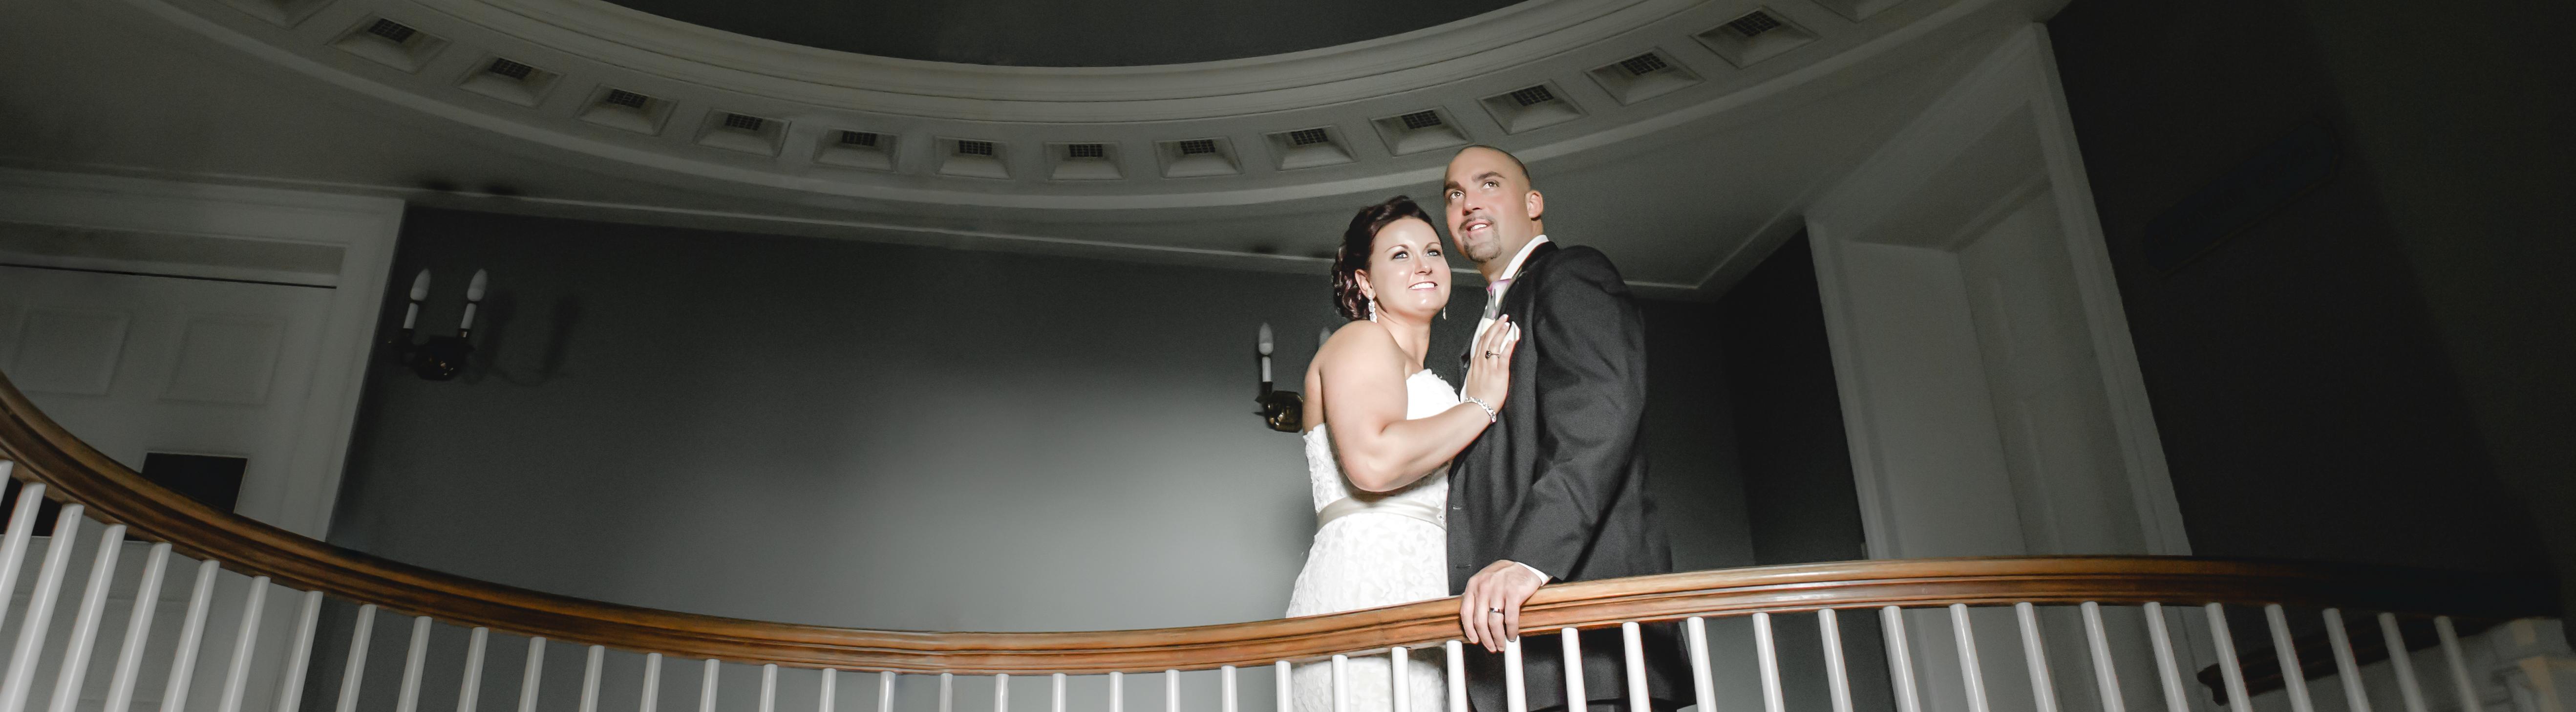 Kristin & Blake Wedding Preview | 6.27.15 | Pittsburgh Wedding Photography